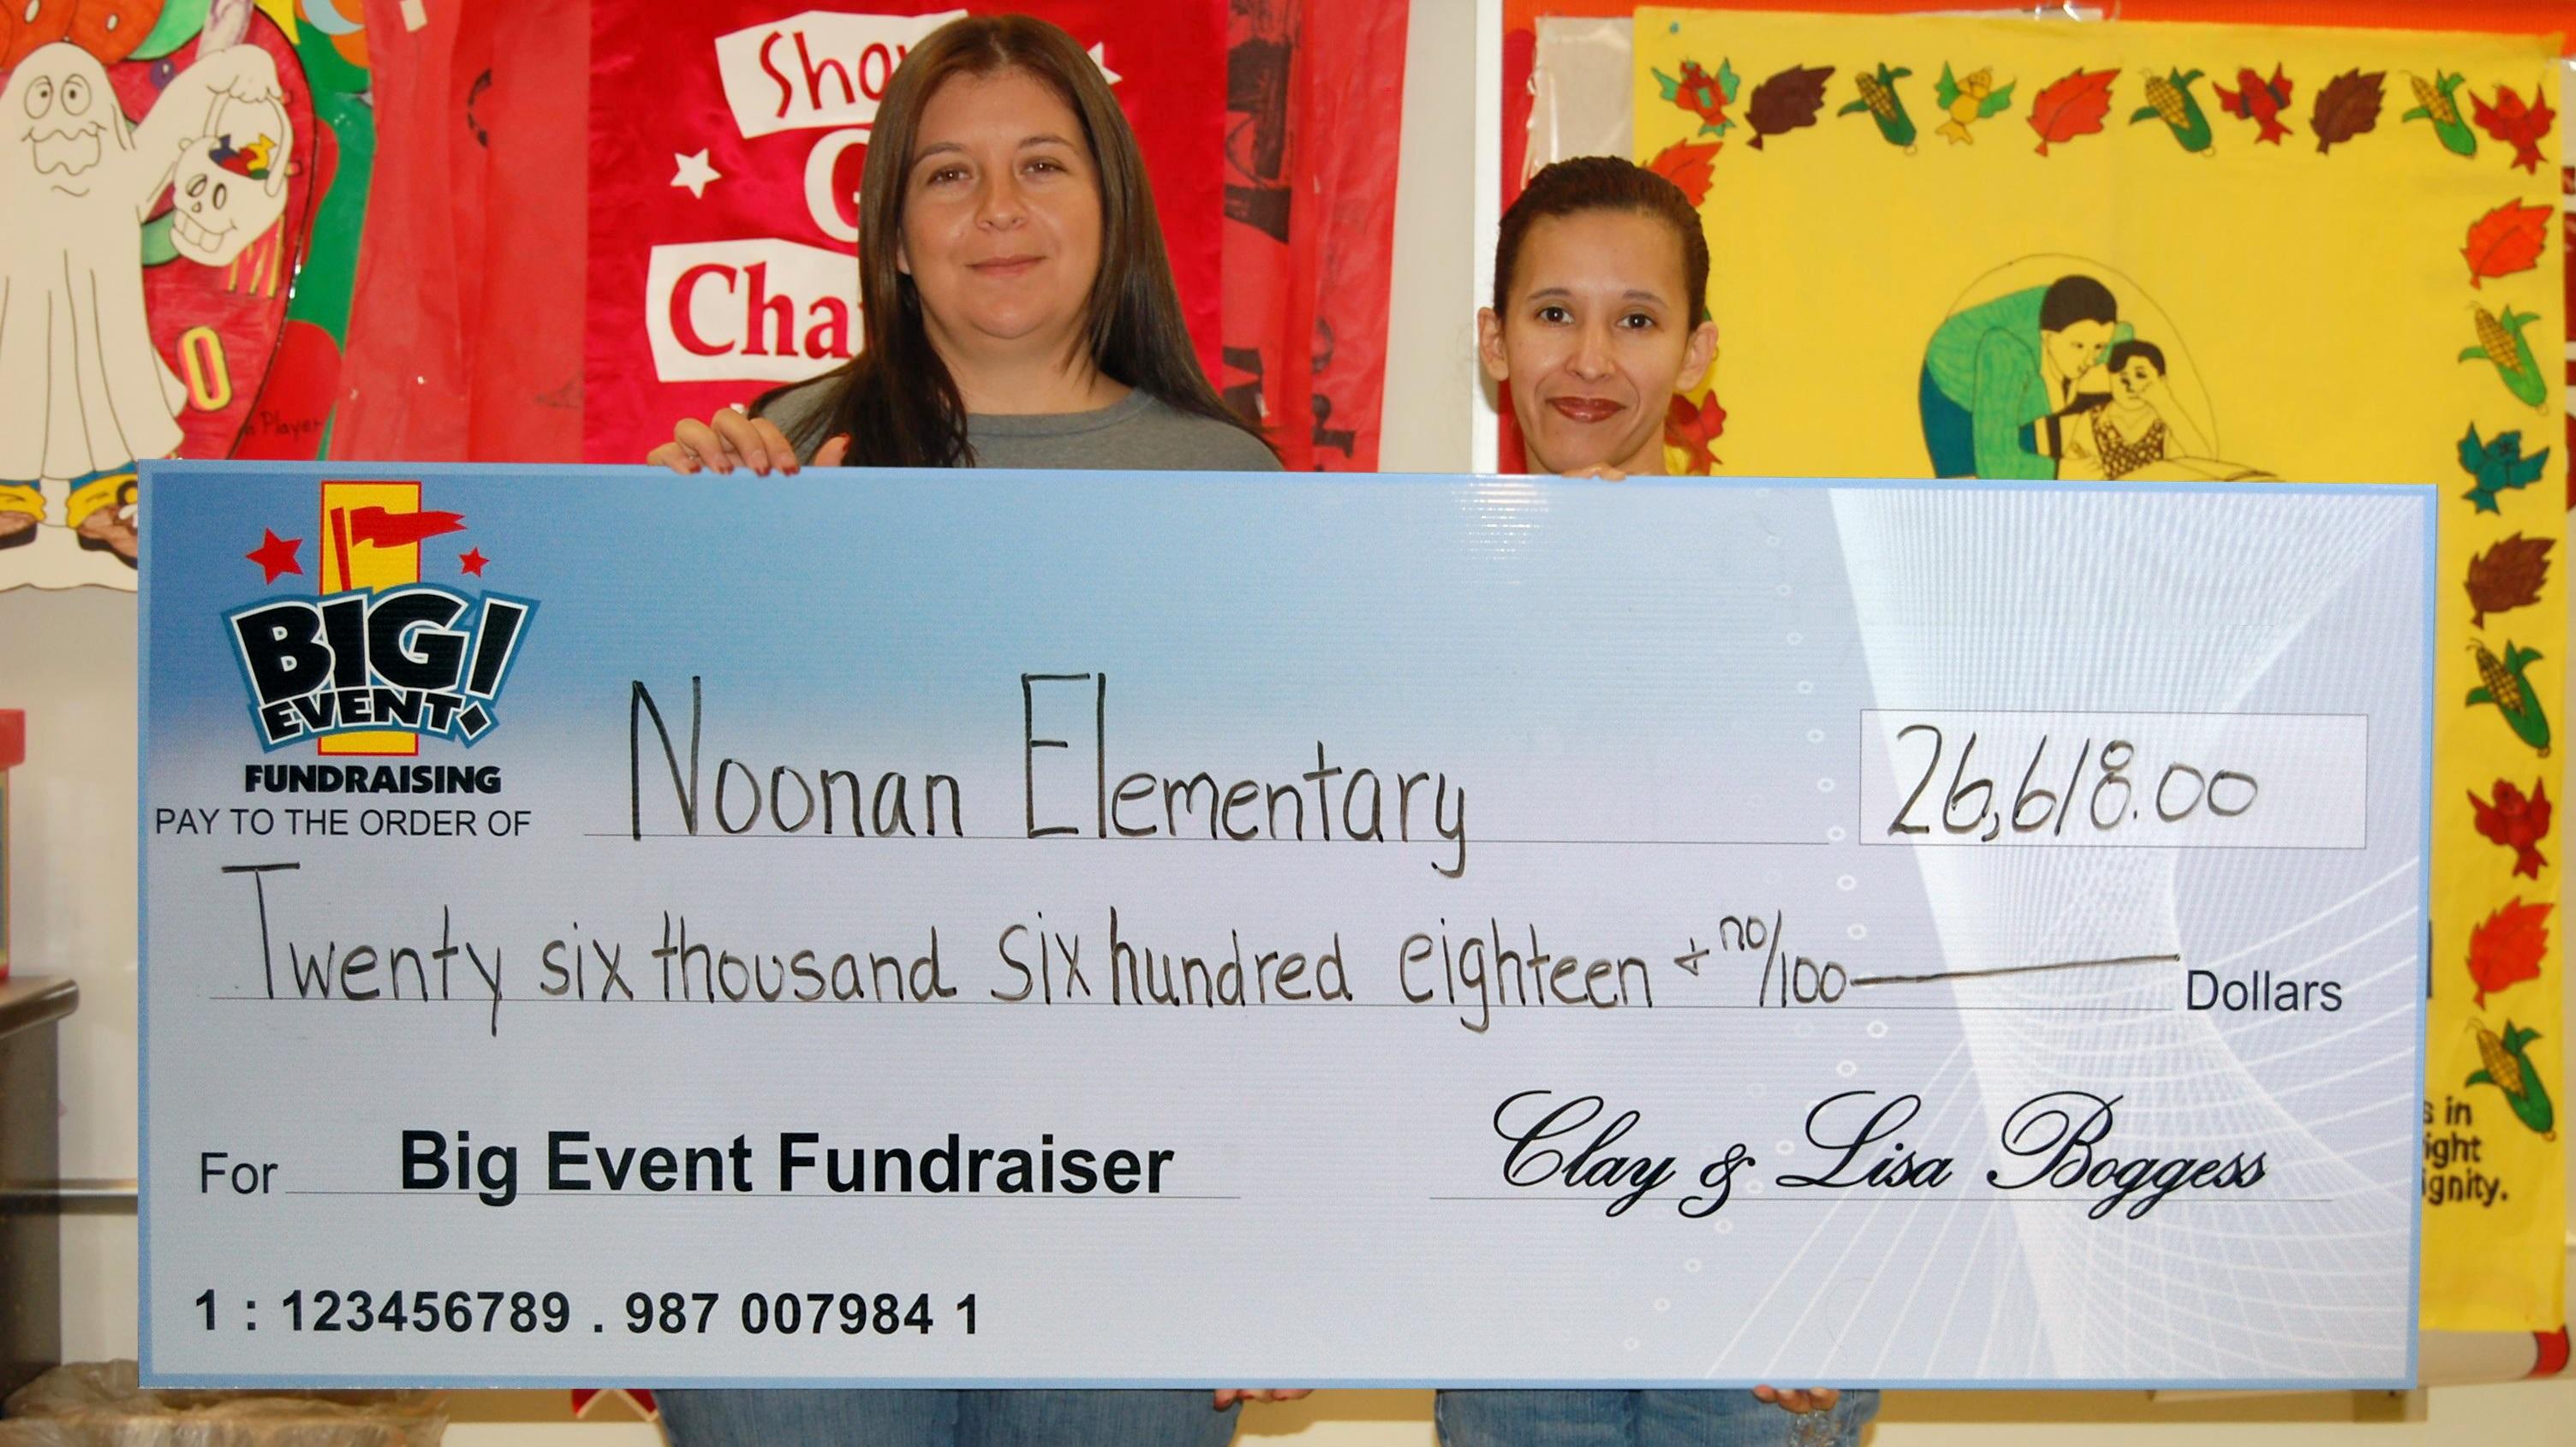 Noonan Elementary fundraising team holding check